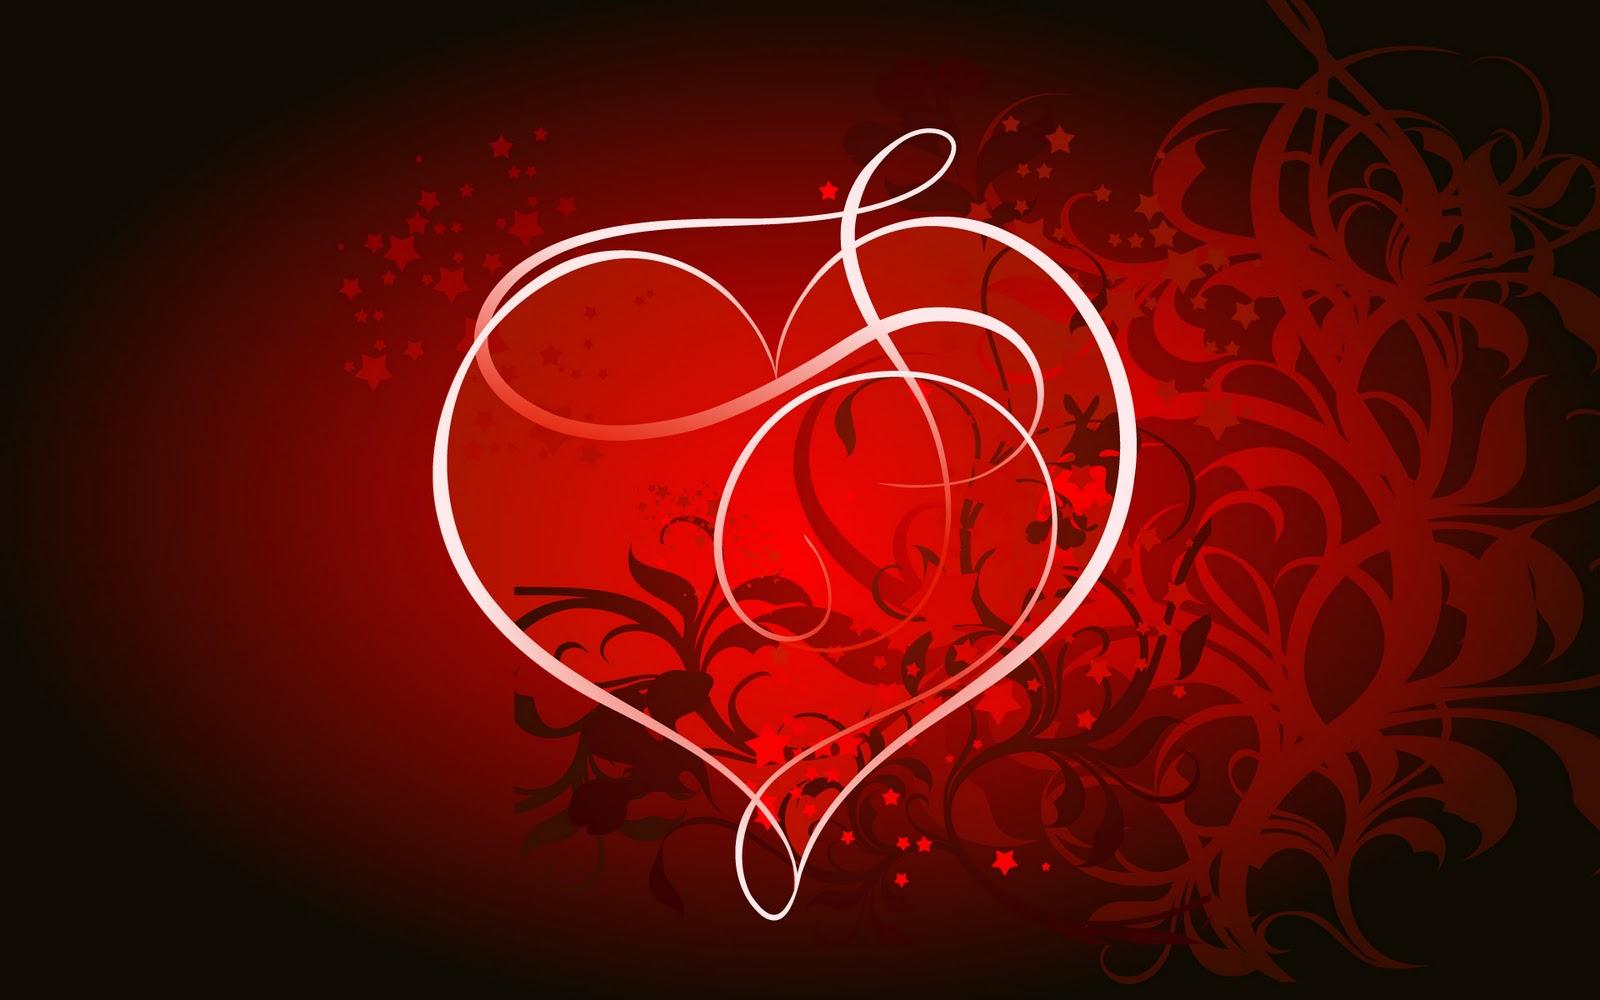 http://2.bp.blogspot.com/-hifhYMhUkJk/ToqLvuHQUEI/AAAAAAAAAlU/ZuGAwBciW1Q/s1600/Romantic-Heart-Wallpaper-Romantic-Love-Wallpapers%20%283%29.jpg